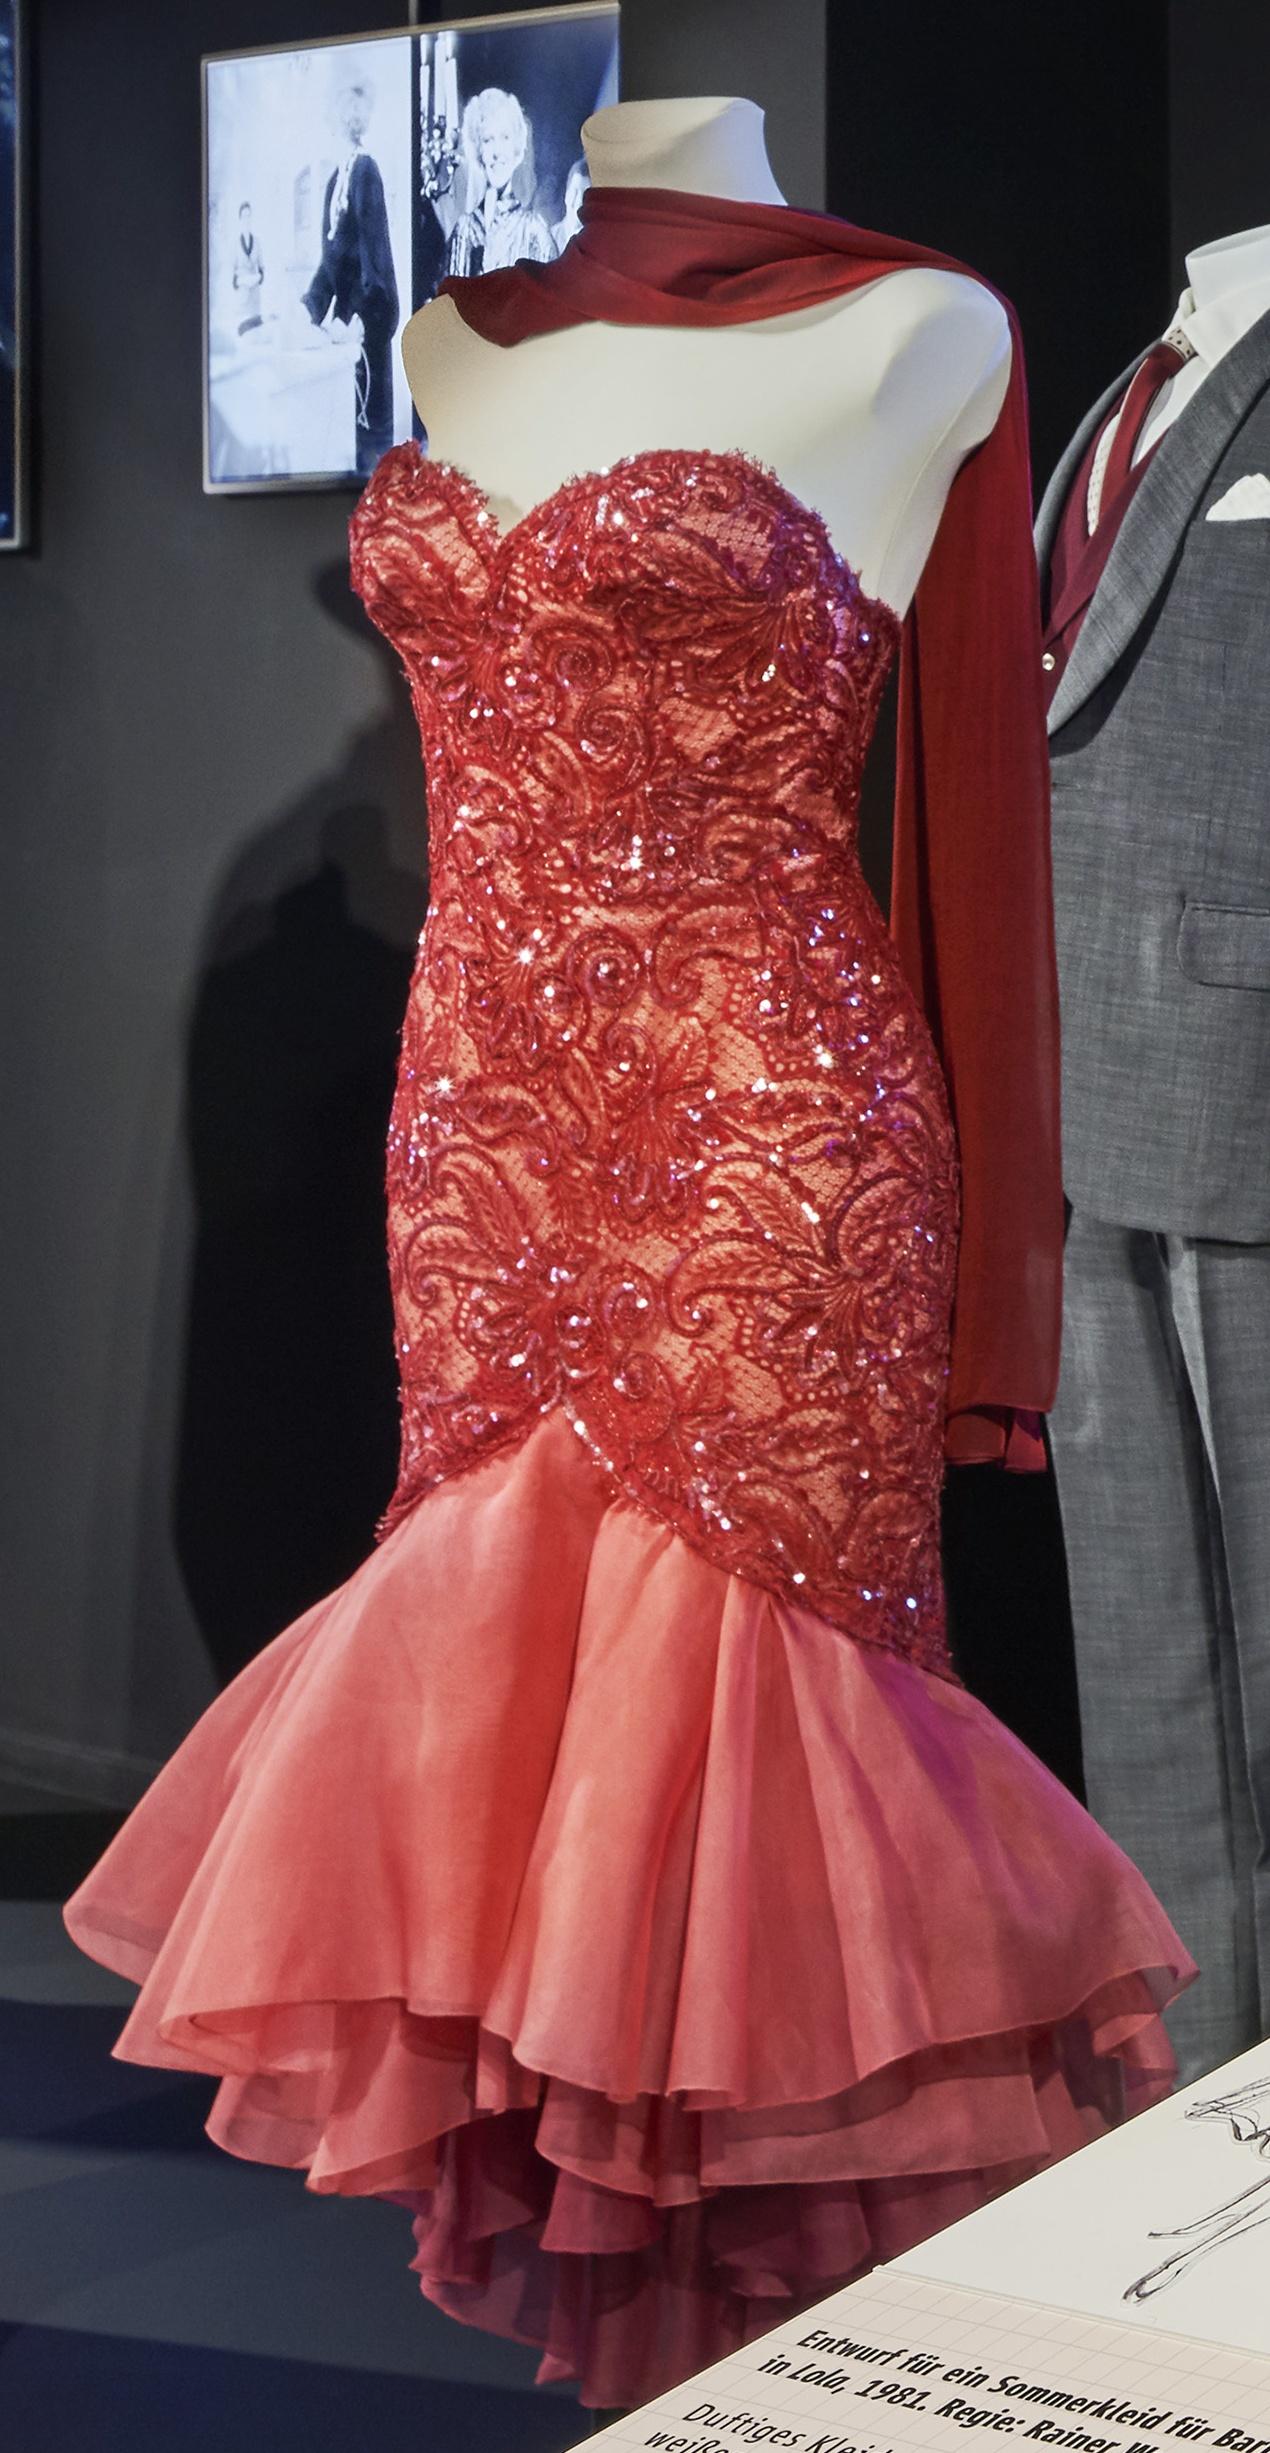 Lola: Rotes Auftrittskleid für Barbara Sukowa als Lola